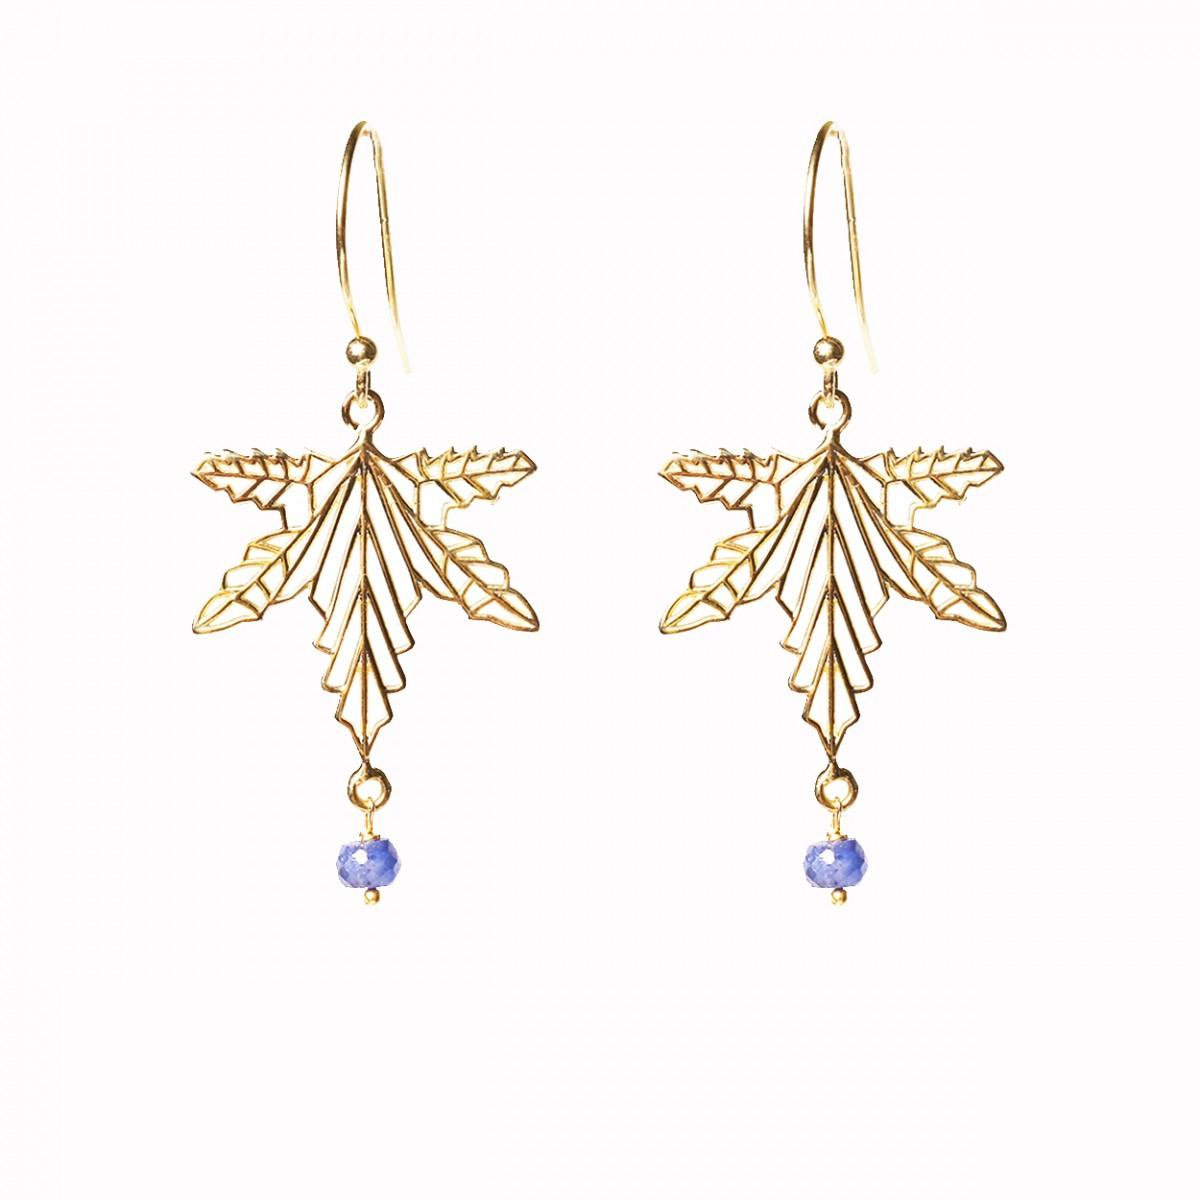 Gemstone Leaf Pendant Earrings - Sapphire